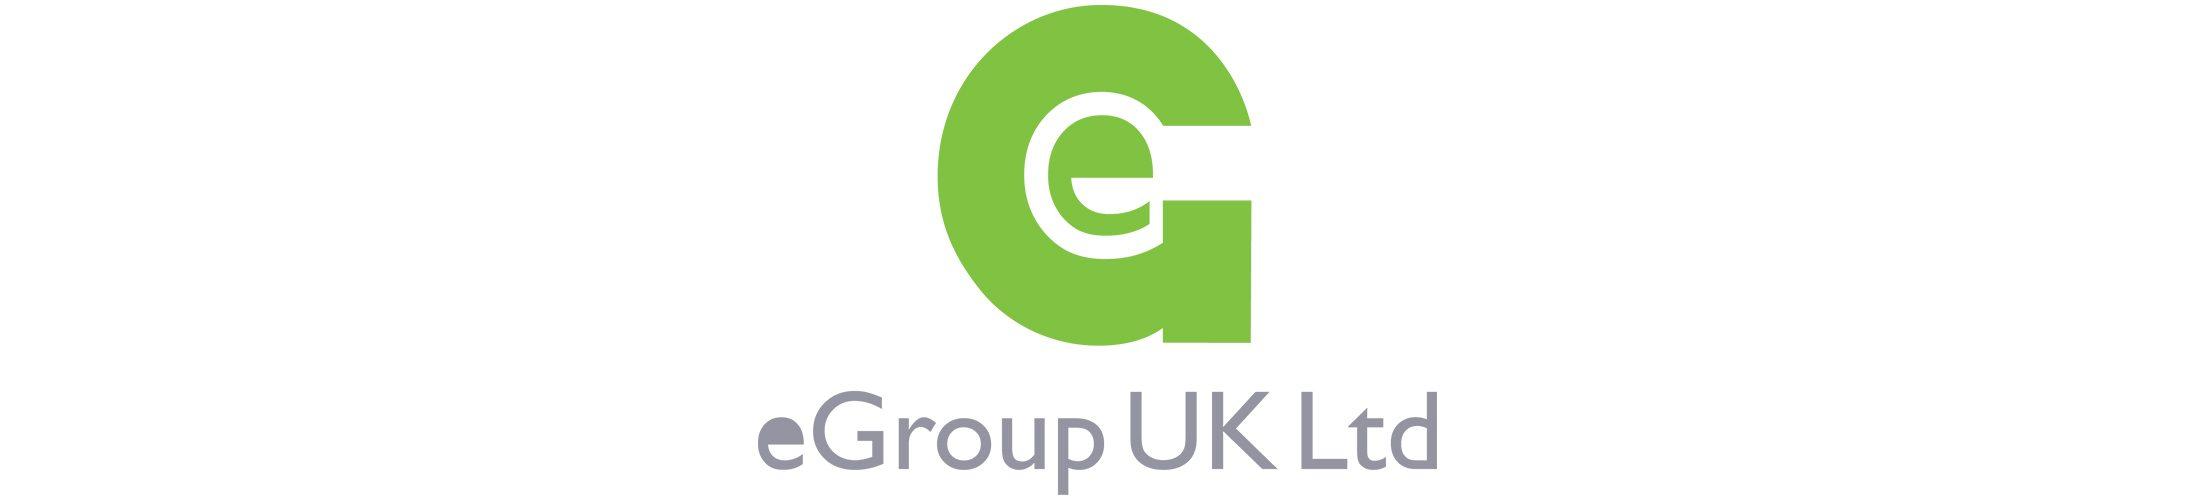 EGROUP UK LTD